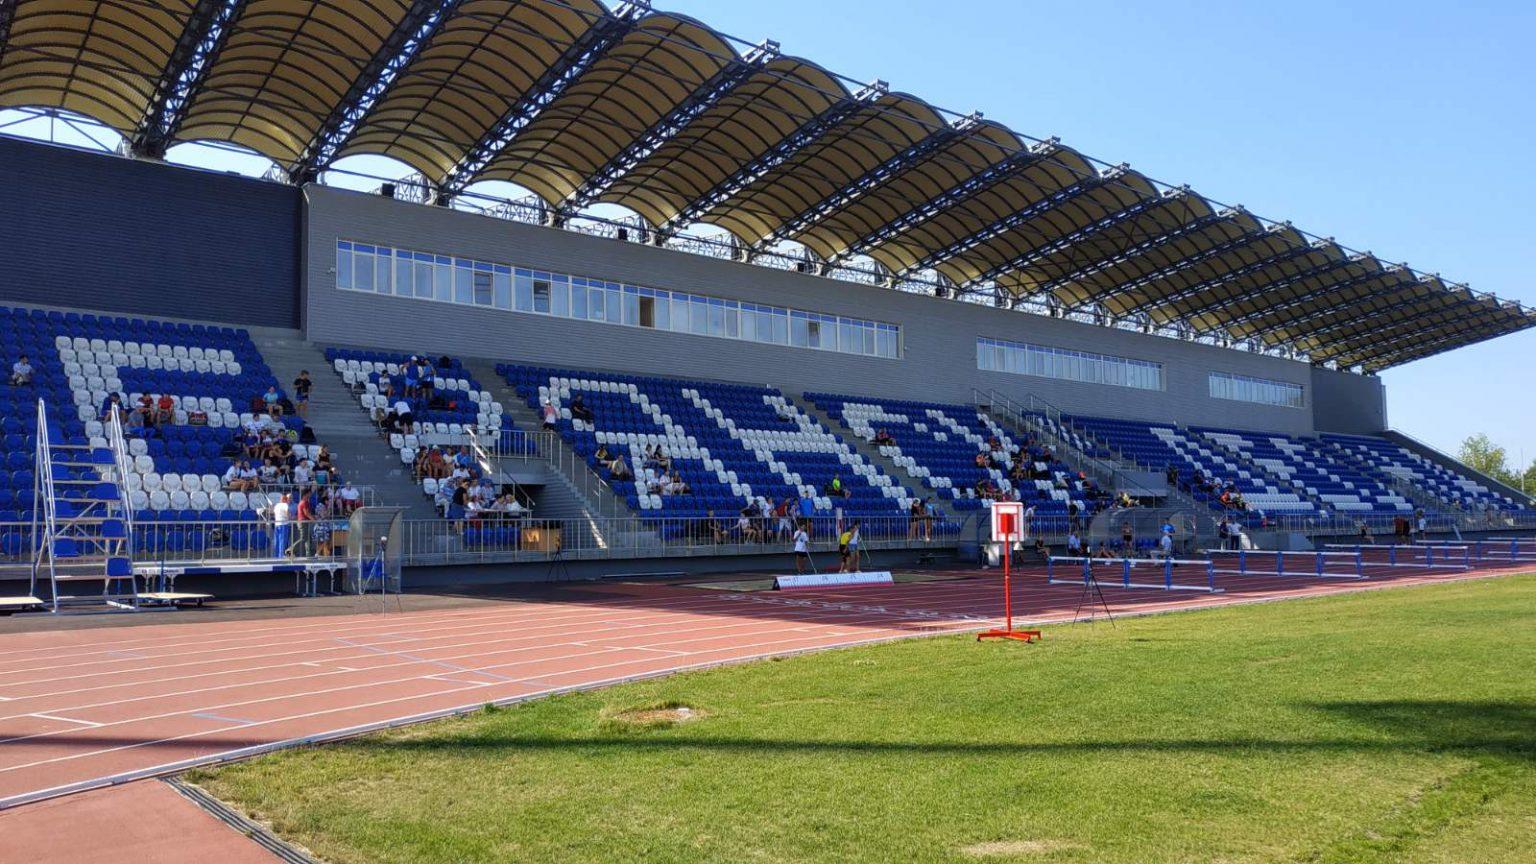 Стадион спорткомбината «Десна» в Брянске реконструируют в 2021 году